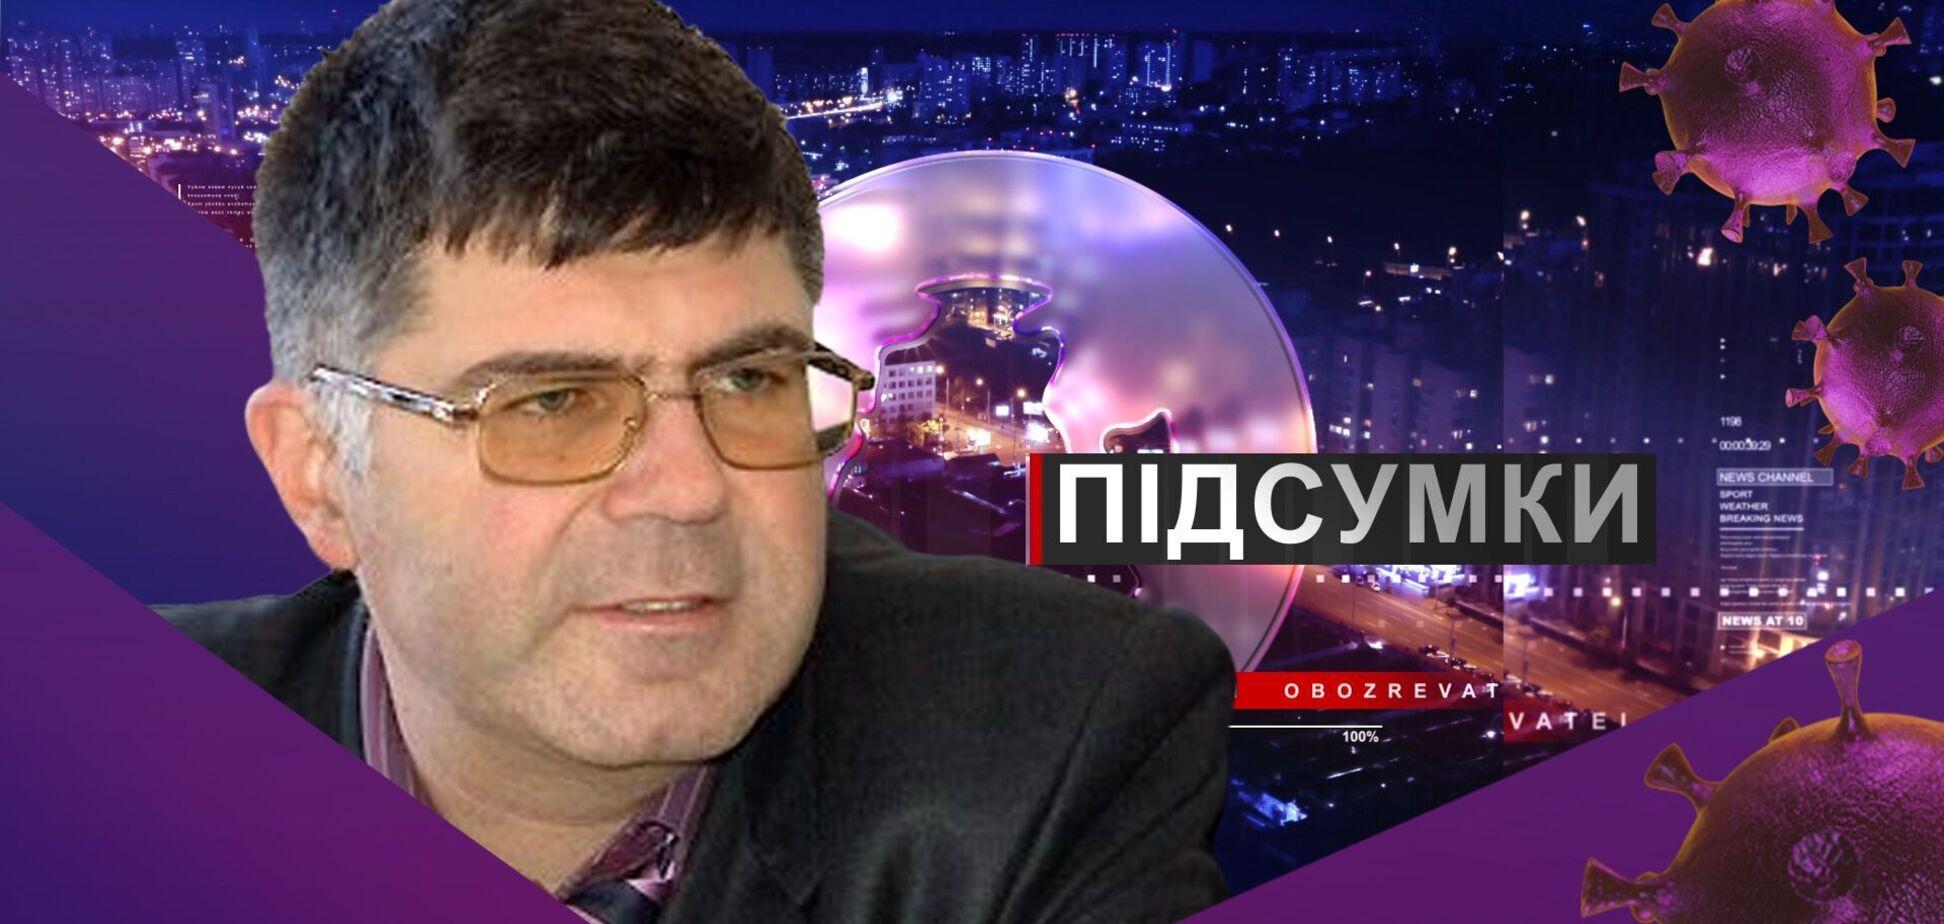 Иммунолог Олег Назар озвучил прогноз вакцинации в Украине